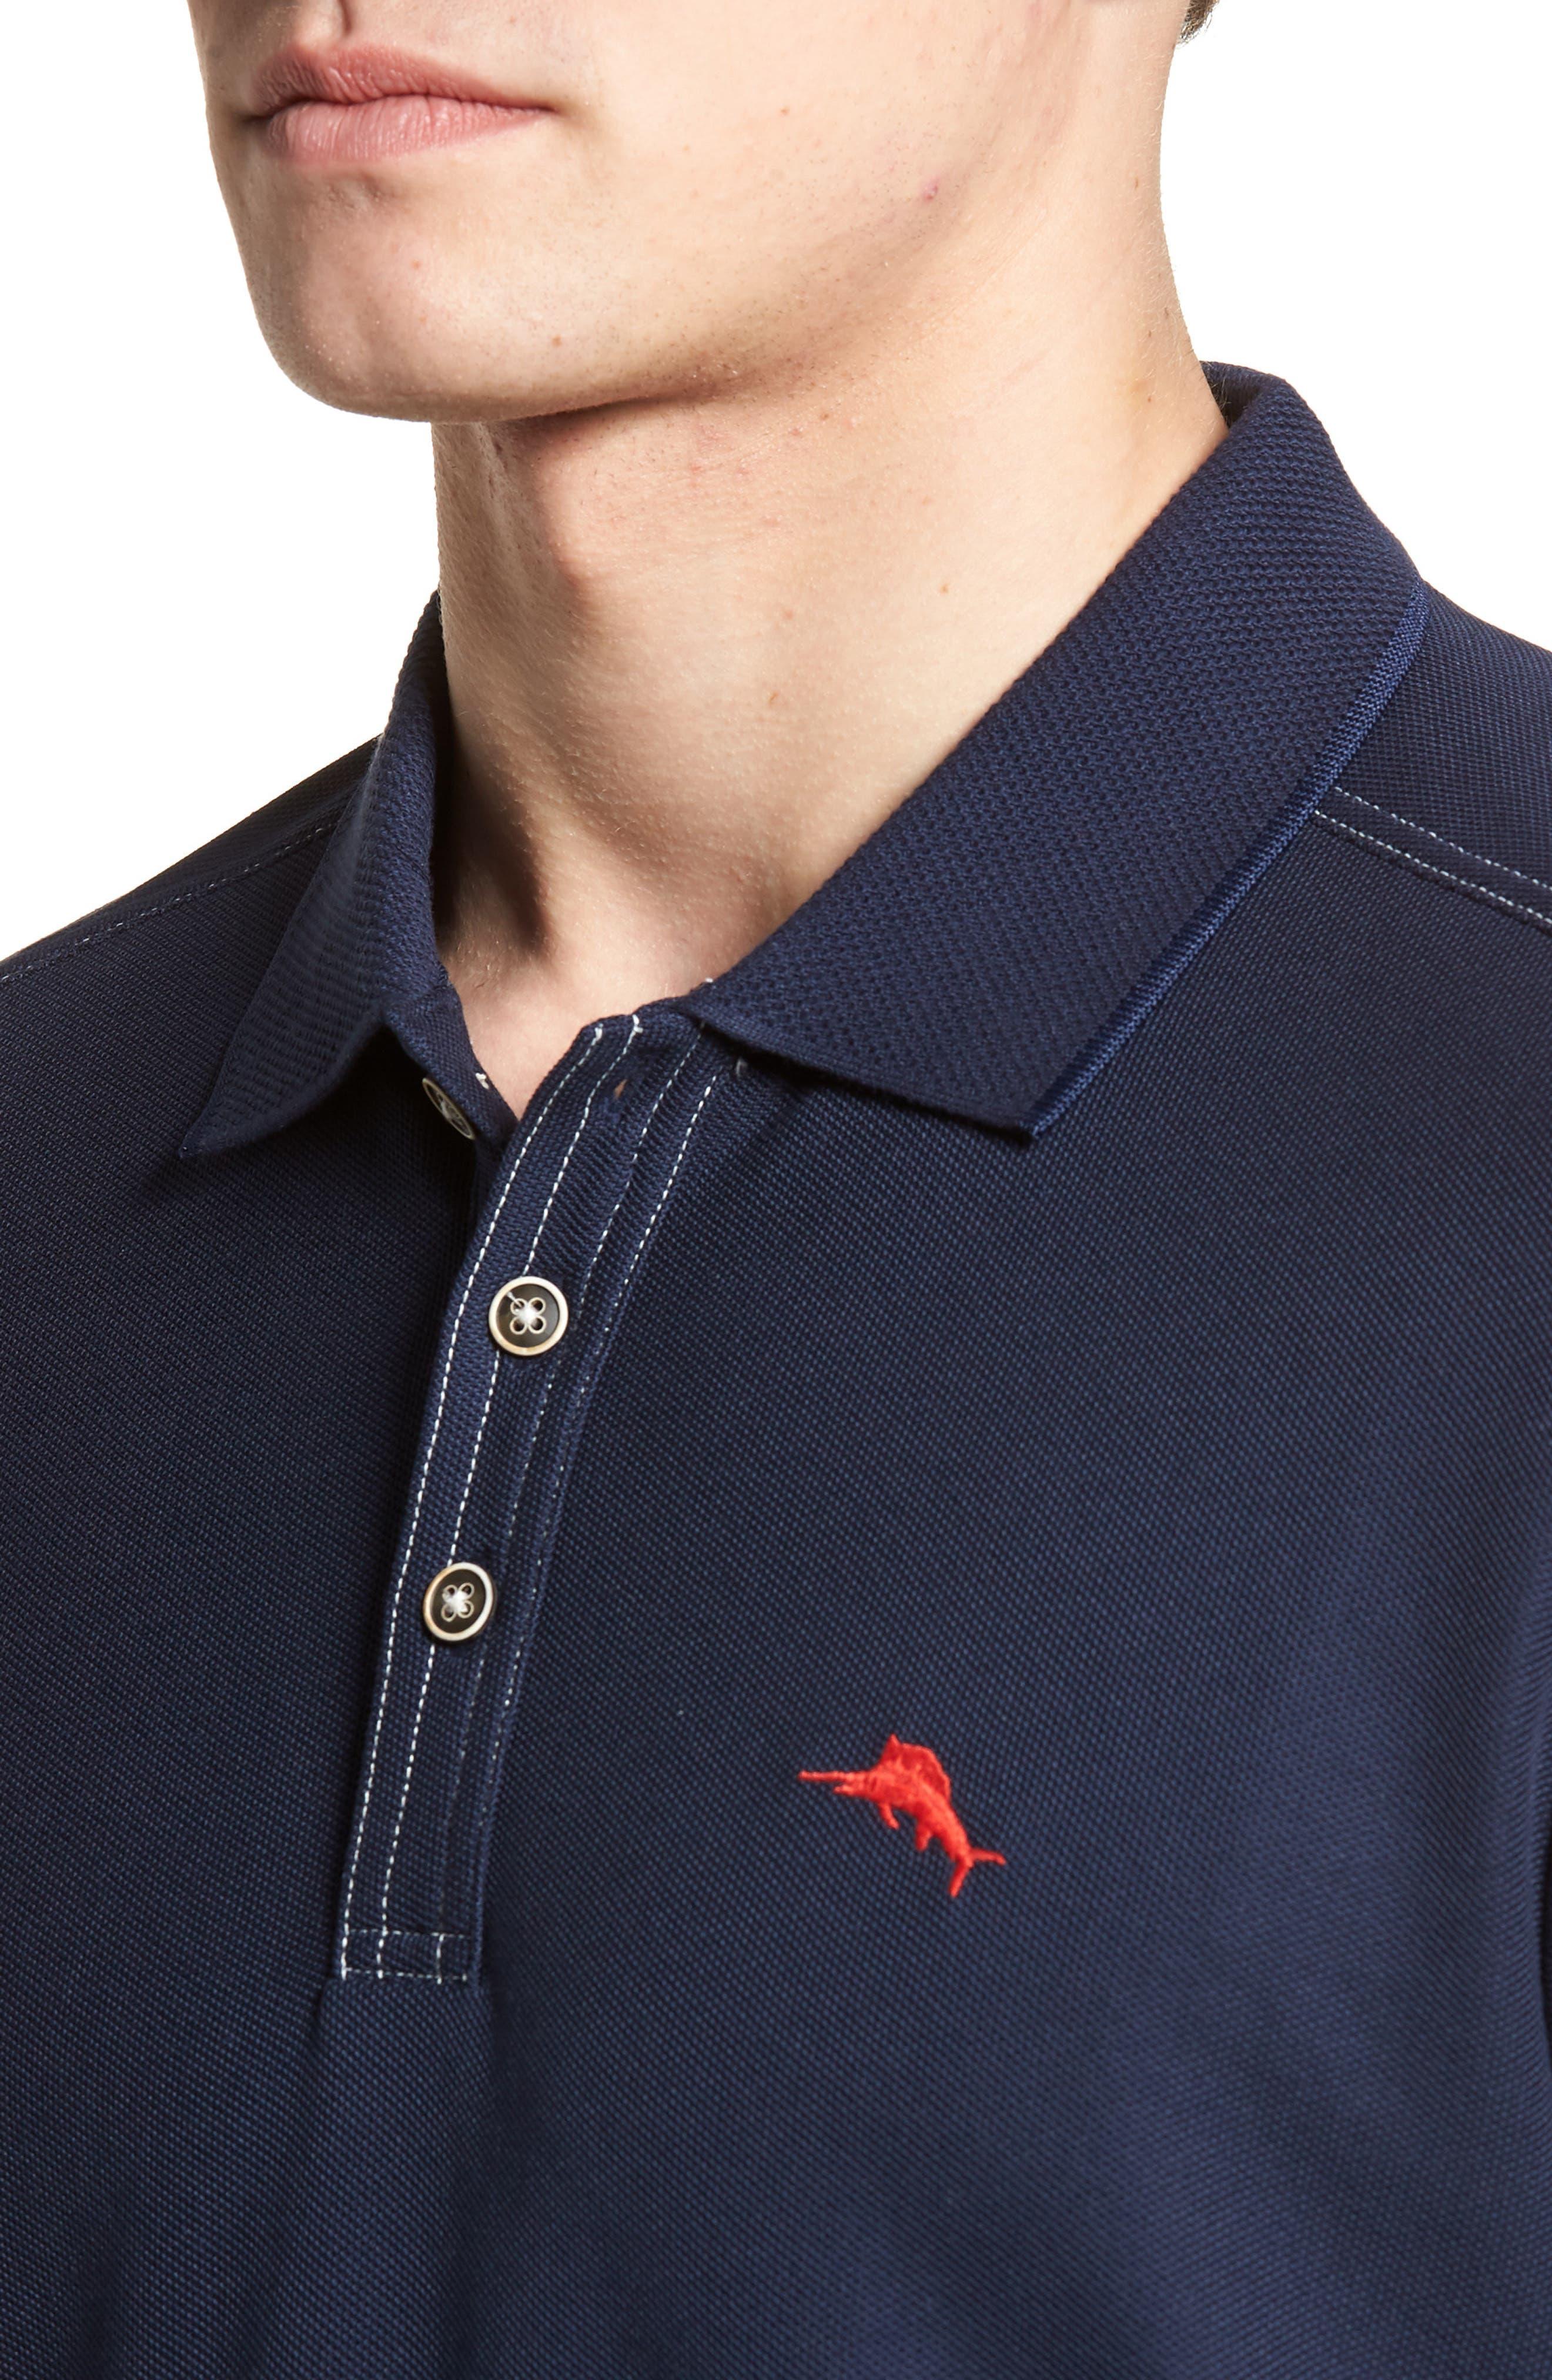 Emfielder Long Sleeve Polo,                             Alternate thumbnail 4, color,                             Blue Note